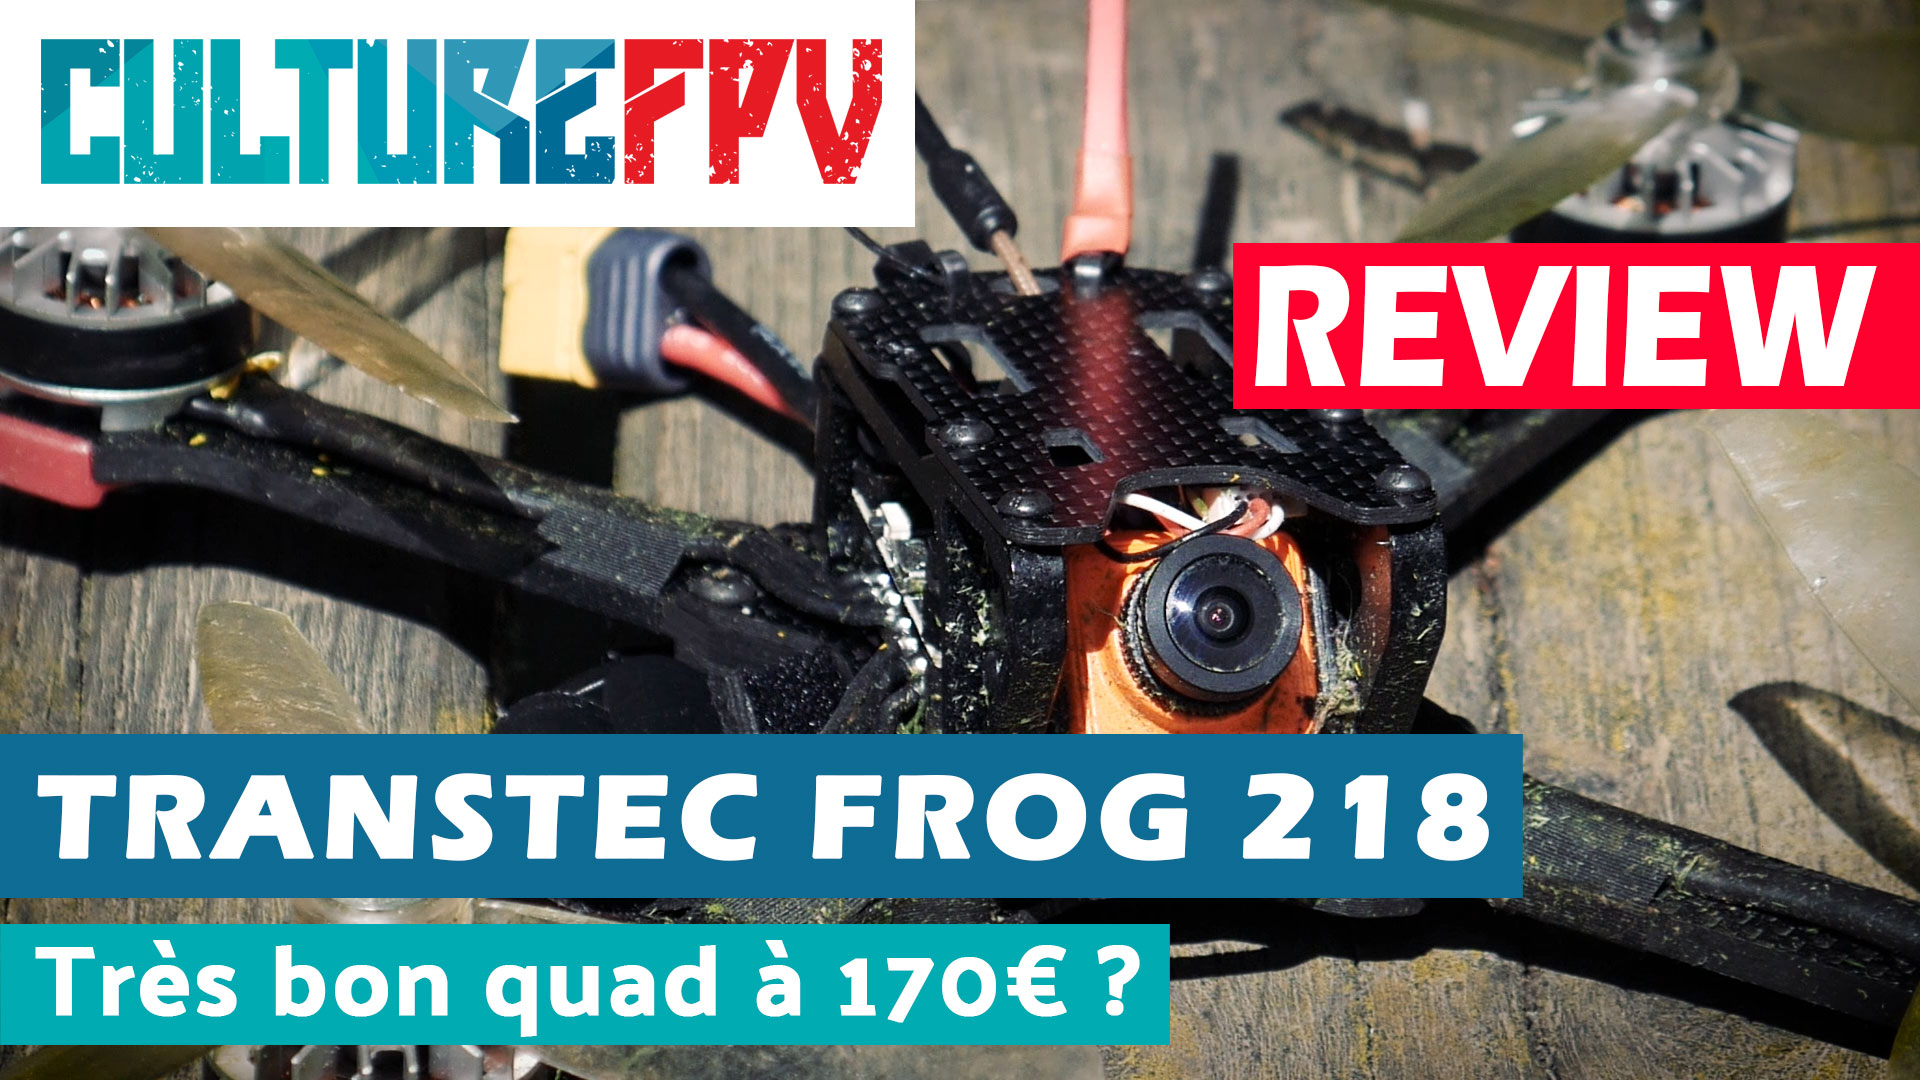 TransTec Frog 218